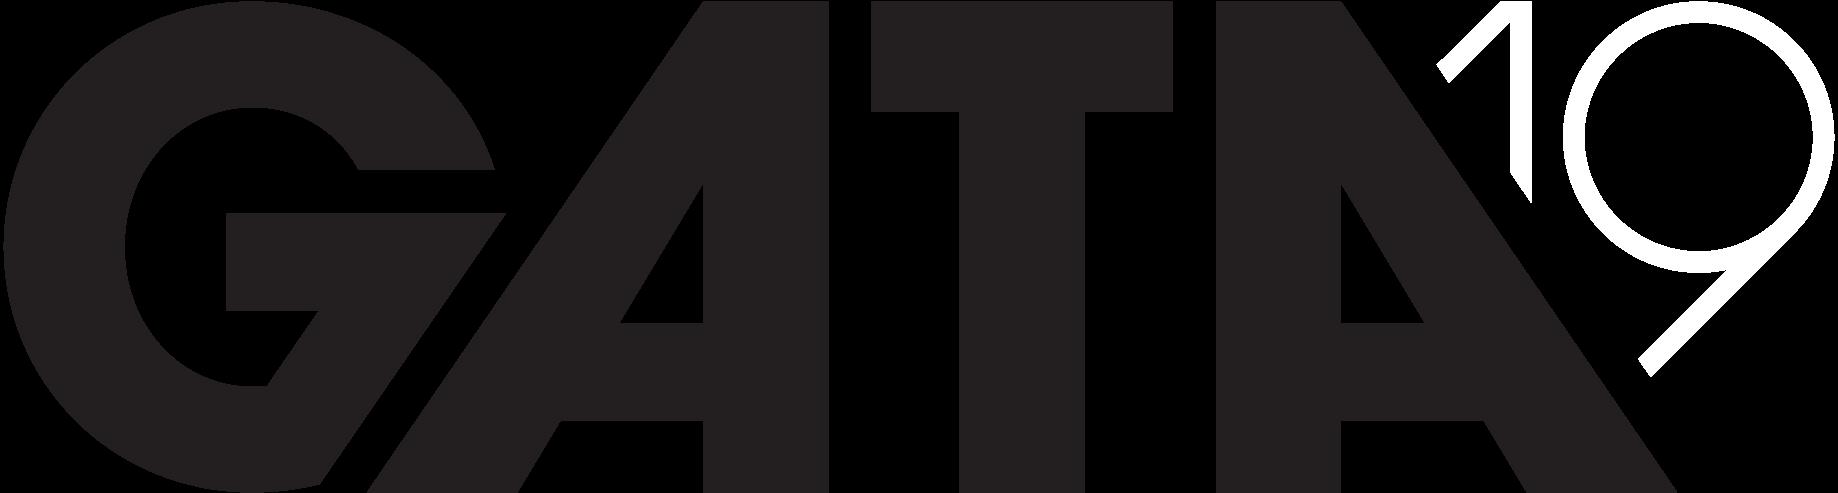 GATA19